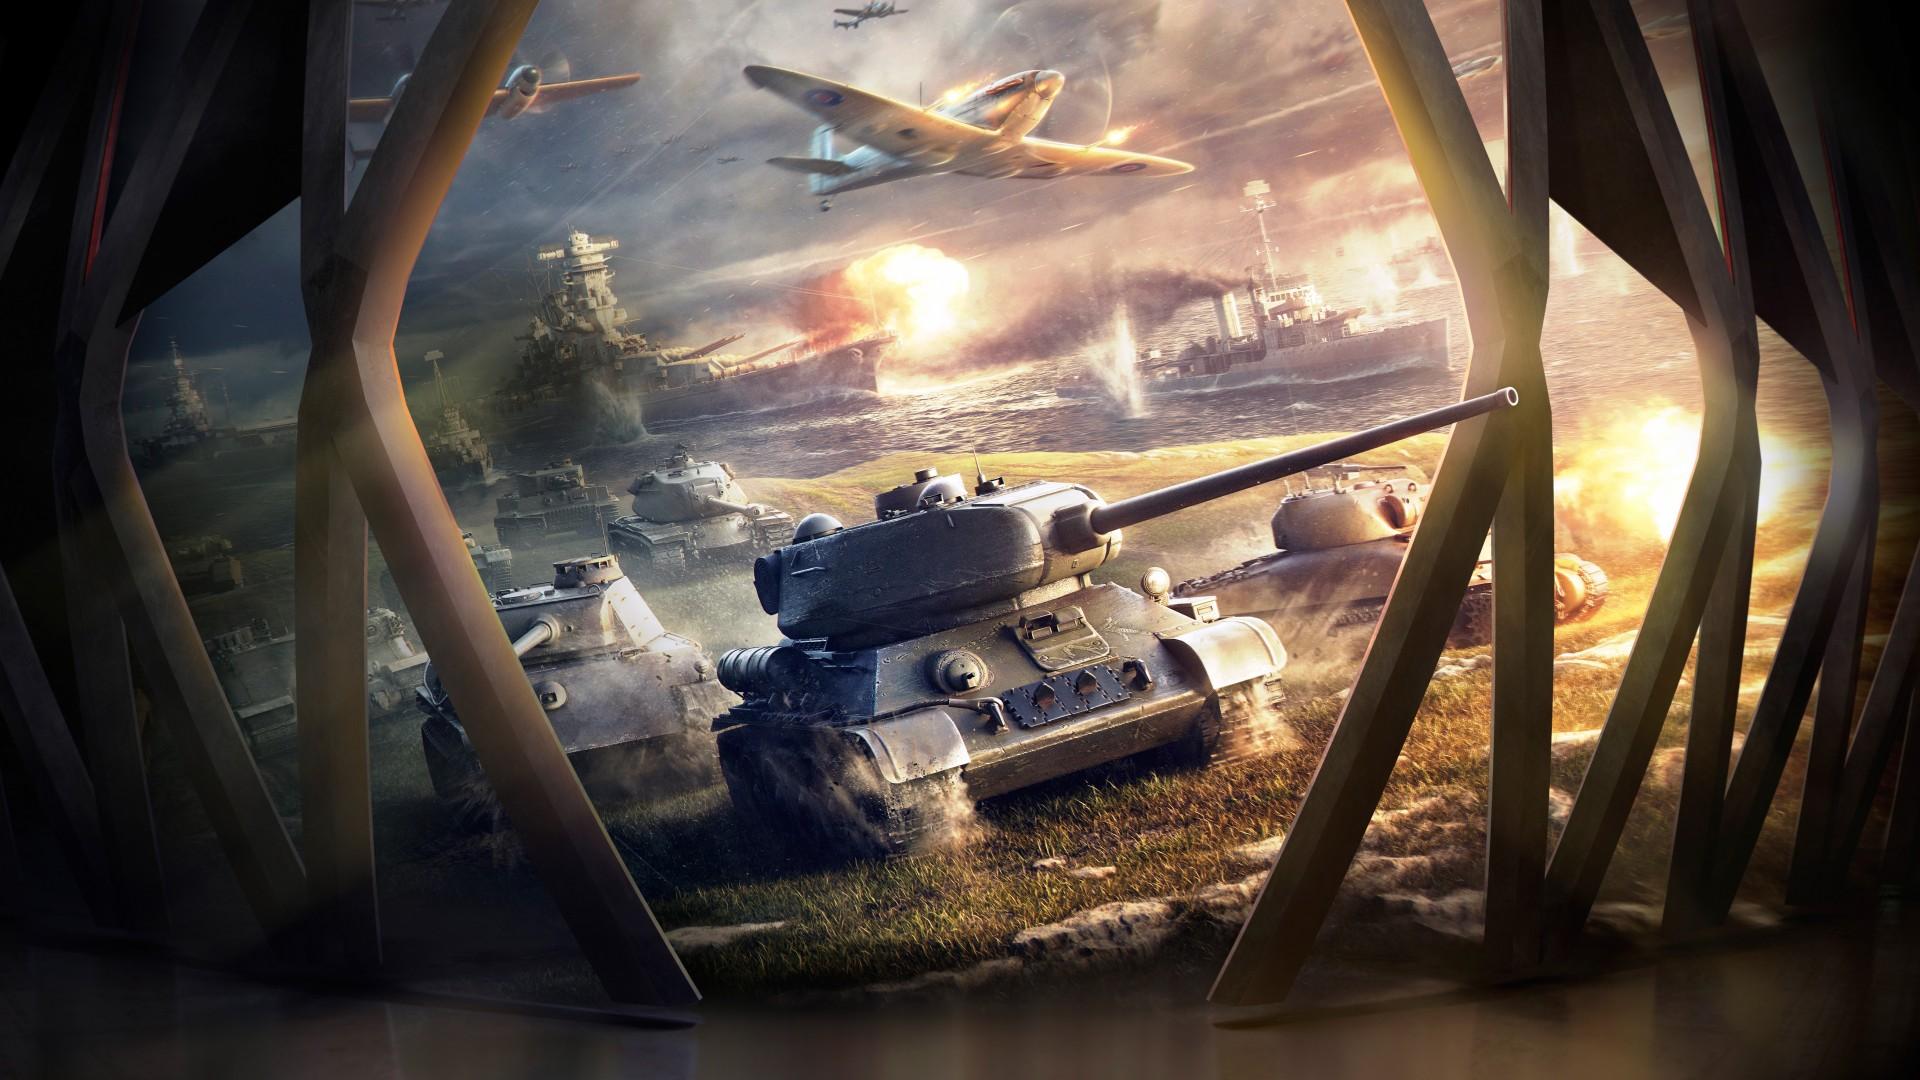 Titanfall Iphone Wallpaper World Of Tanks Blitz Hd 4k Wallpapers Hd Wallpapers Id